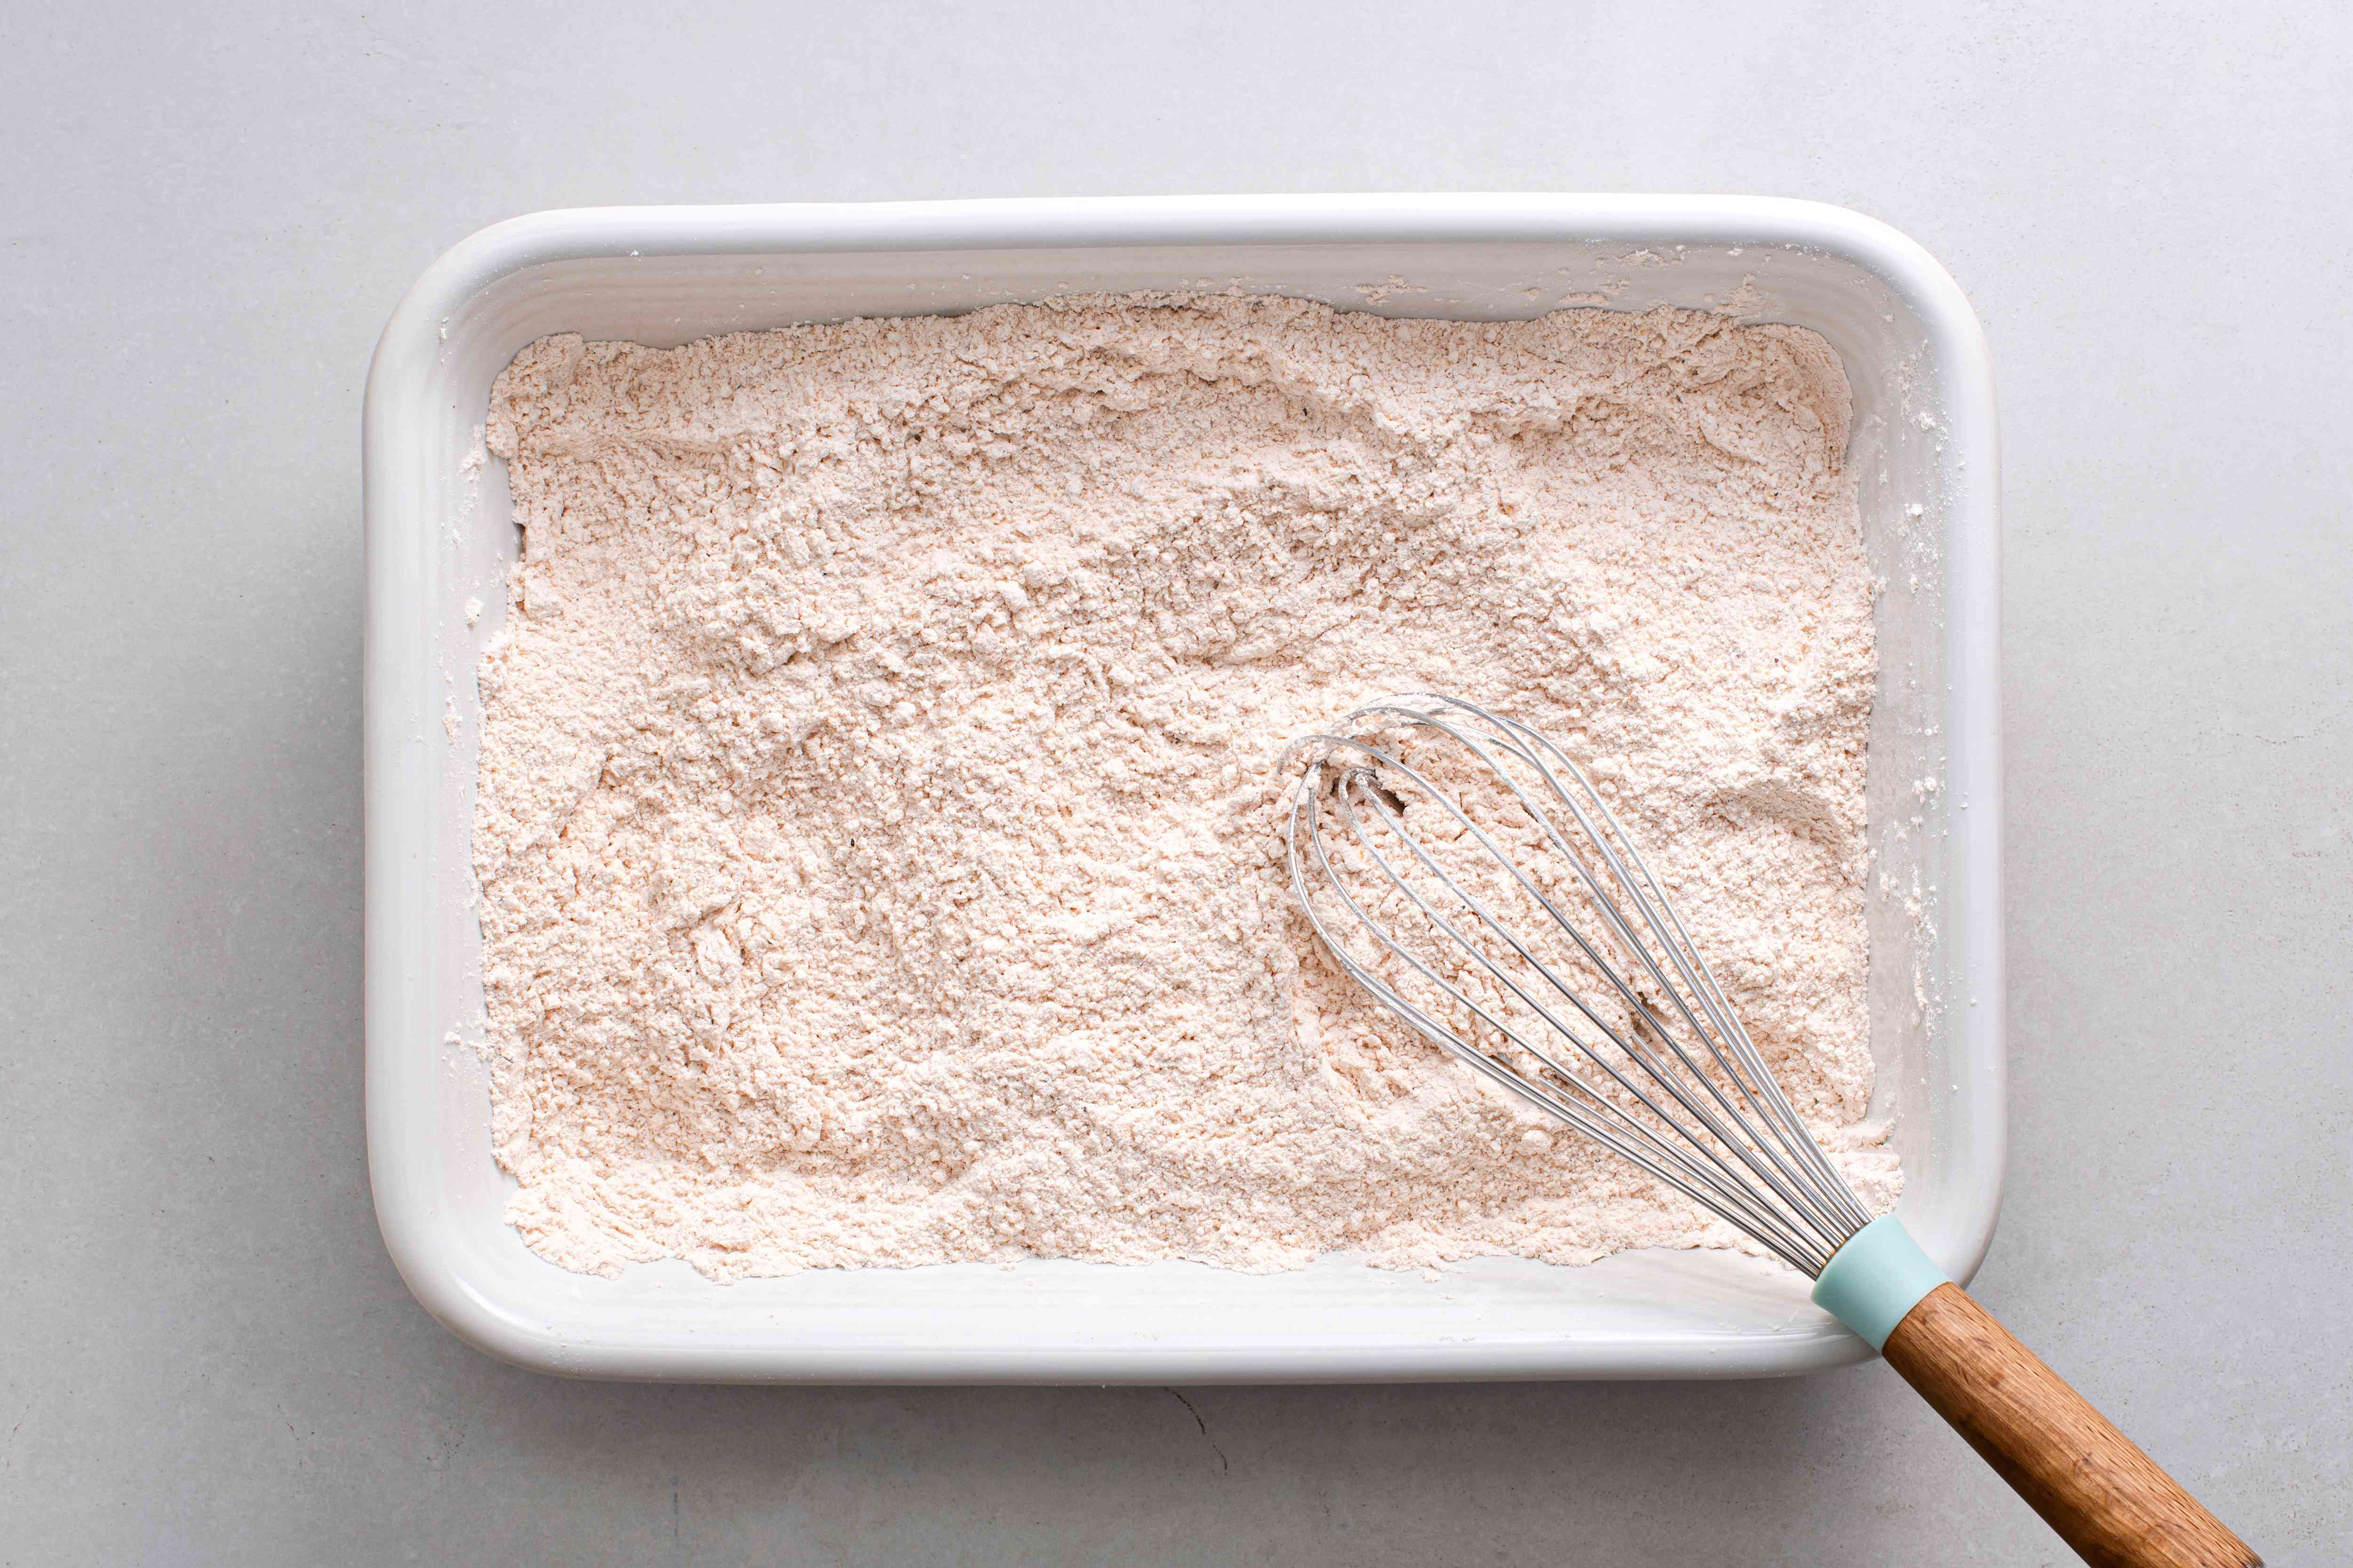 seasoned flour in a baking dish